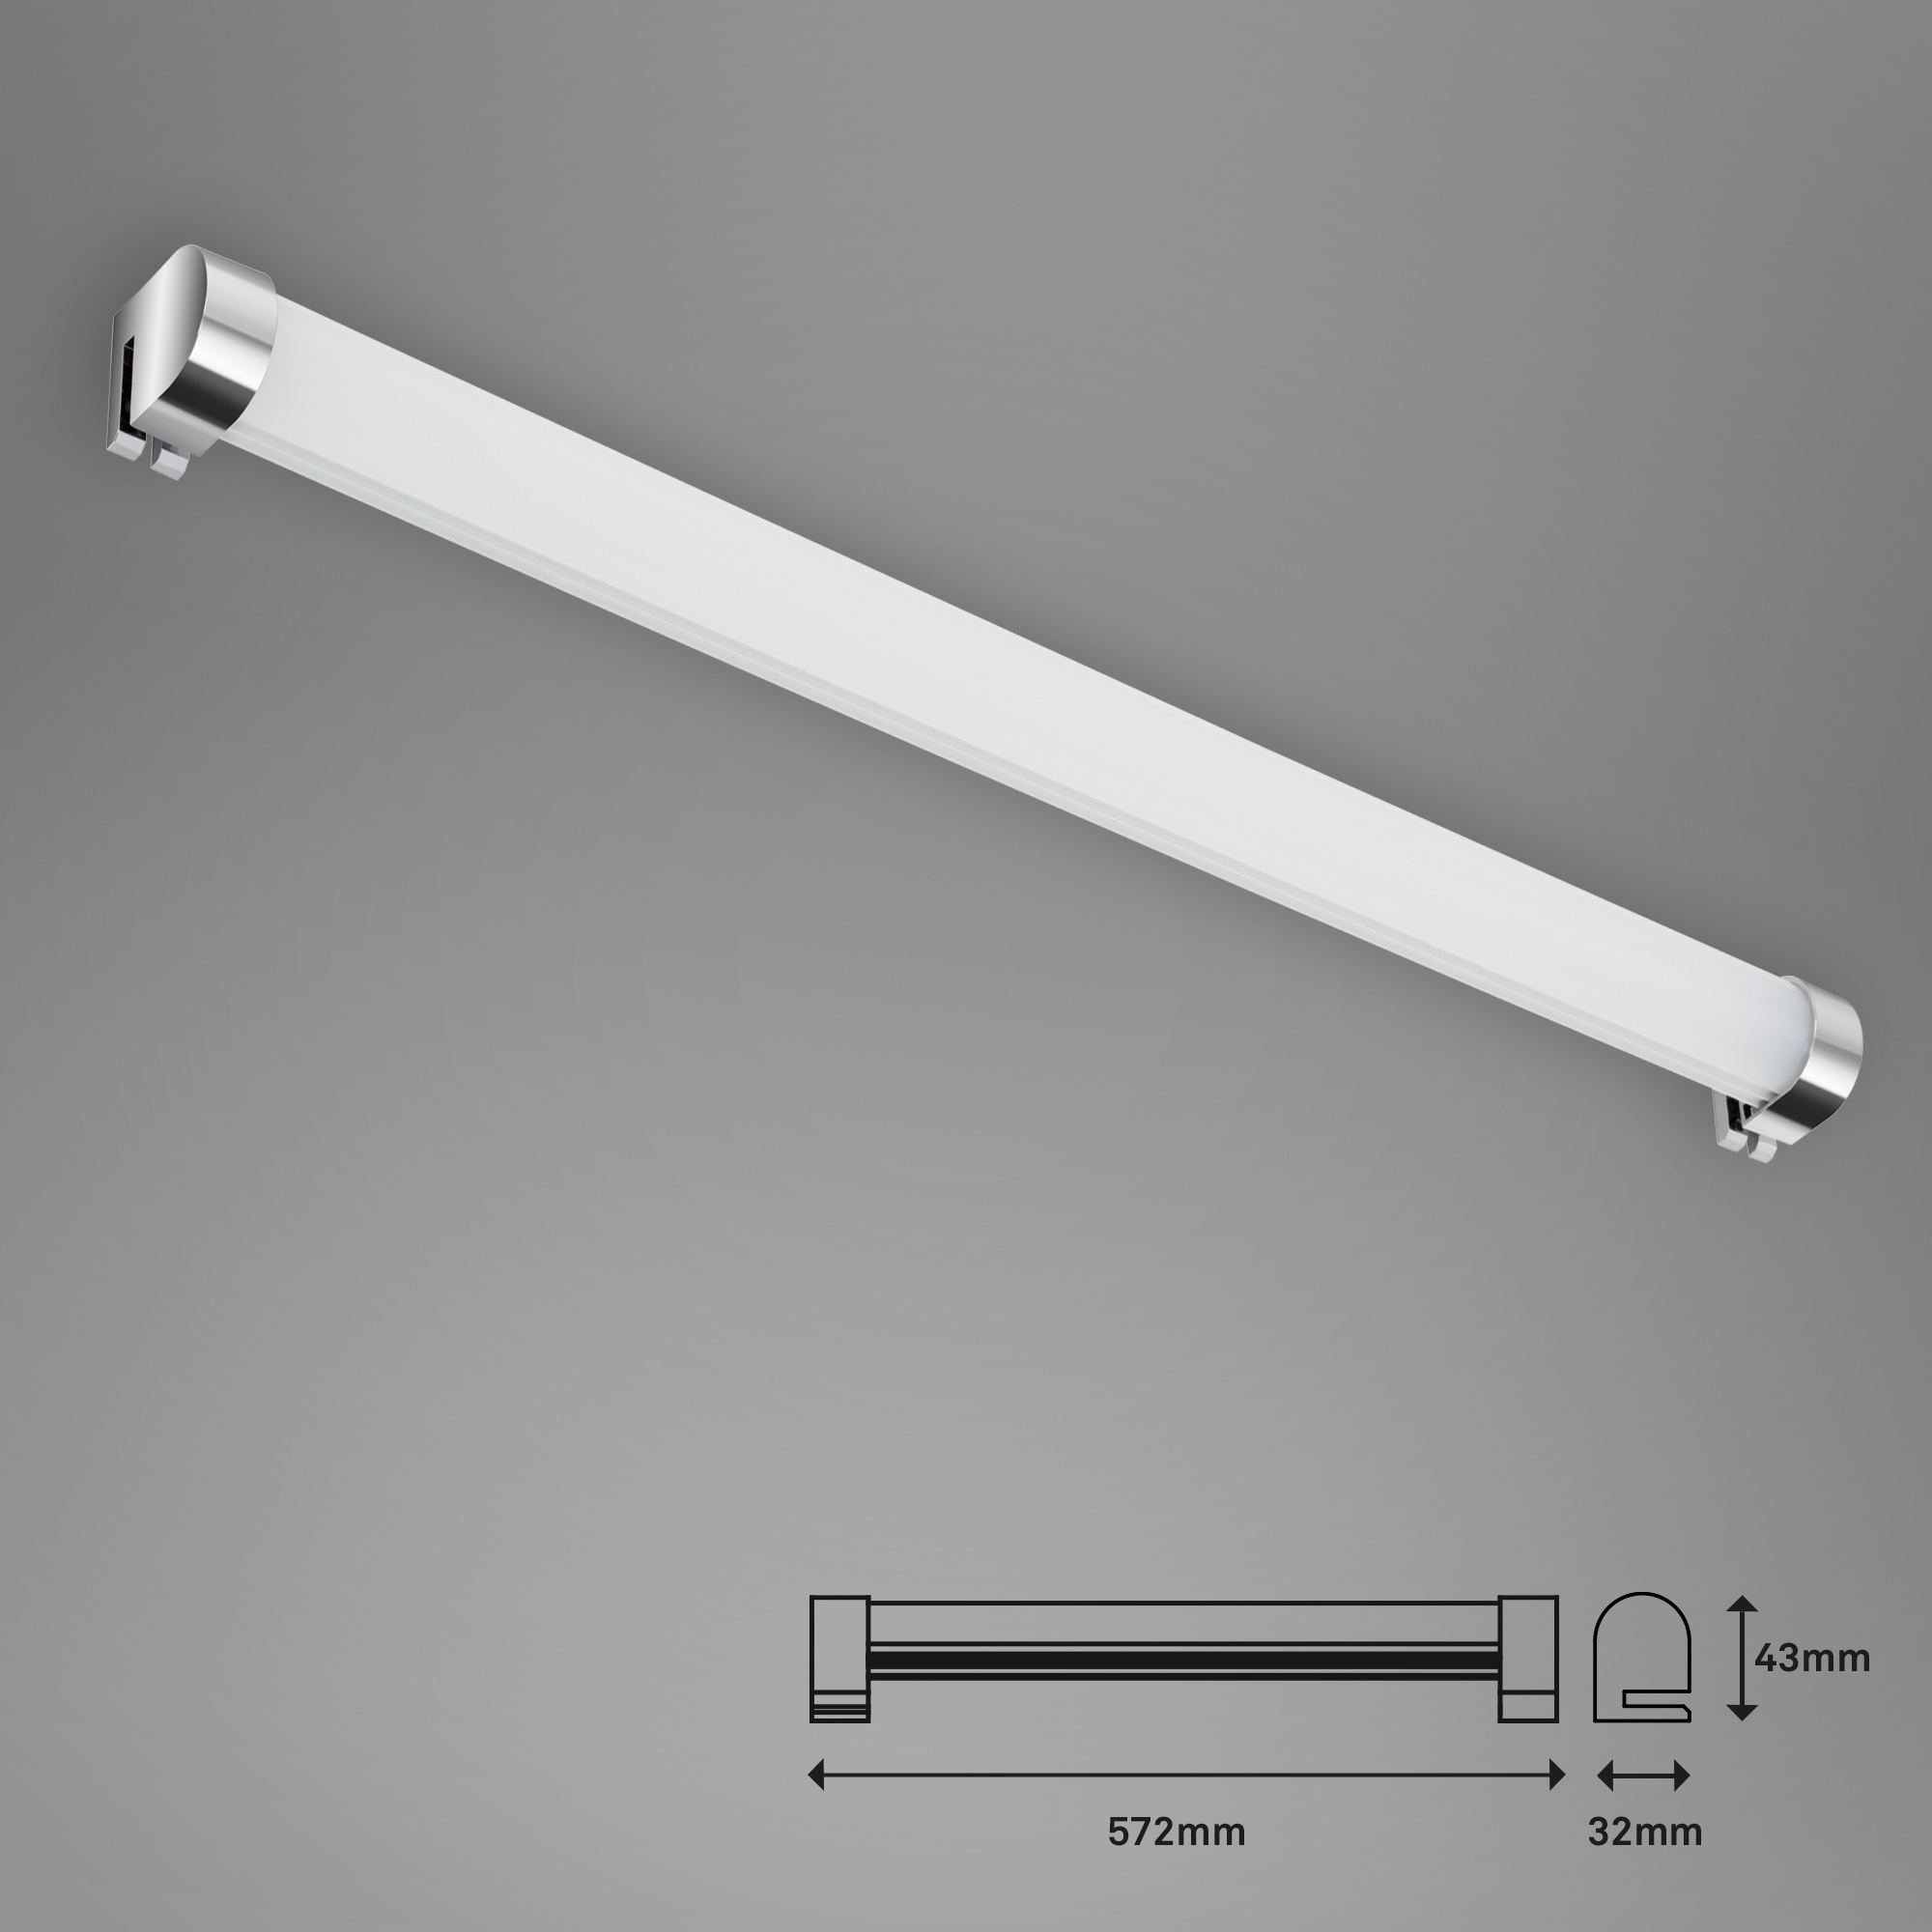 LED Spiegelleuchte, 57,2 cm, 10 W, Chrom